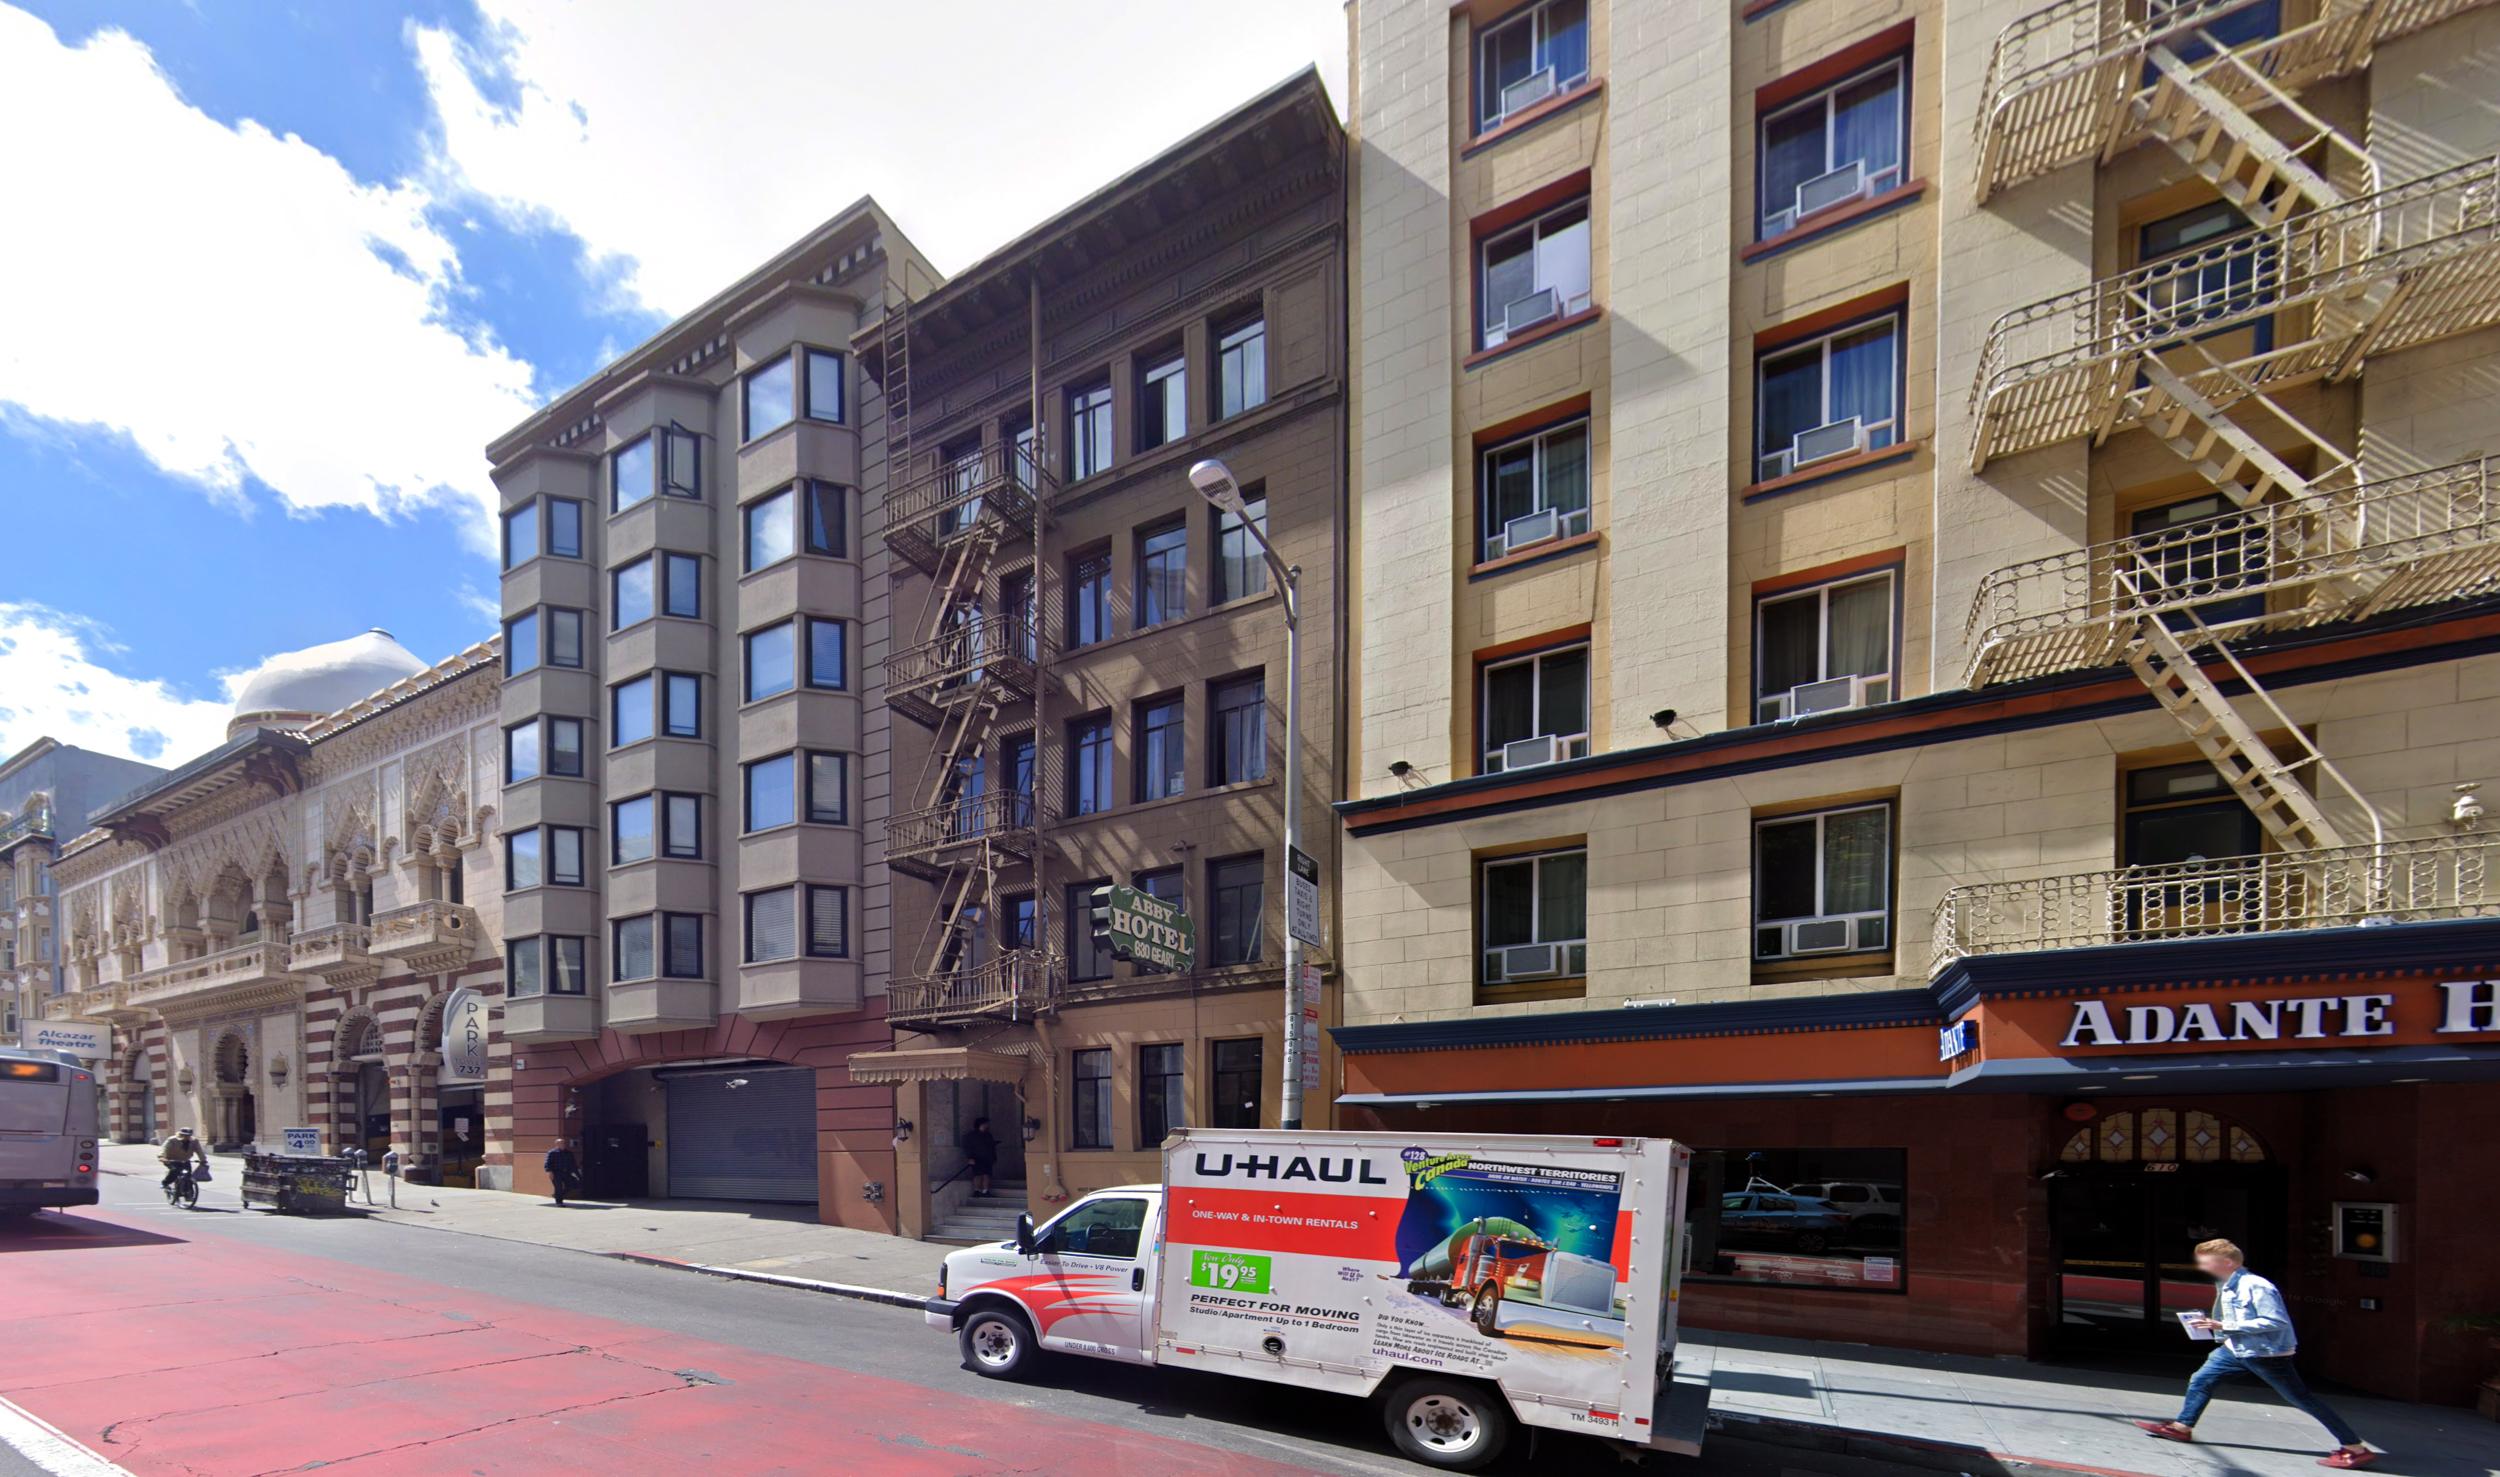 630 Geary Street, image via Google Street View